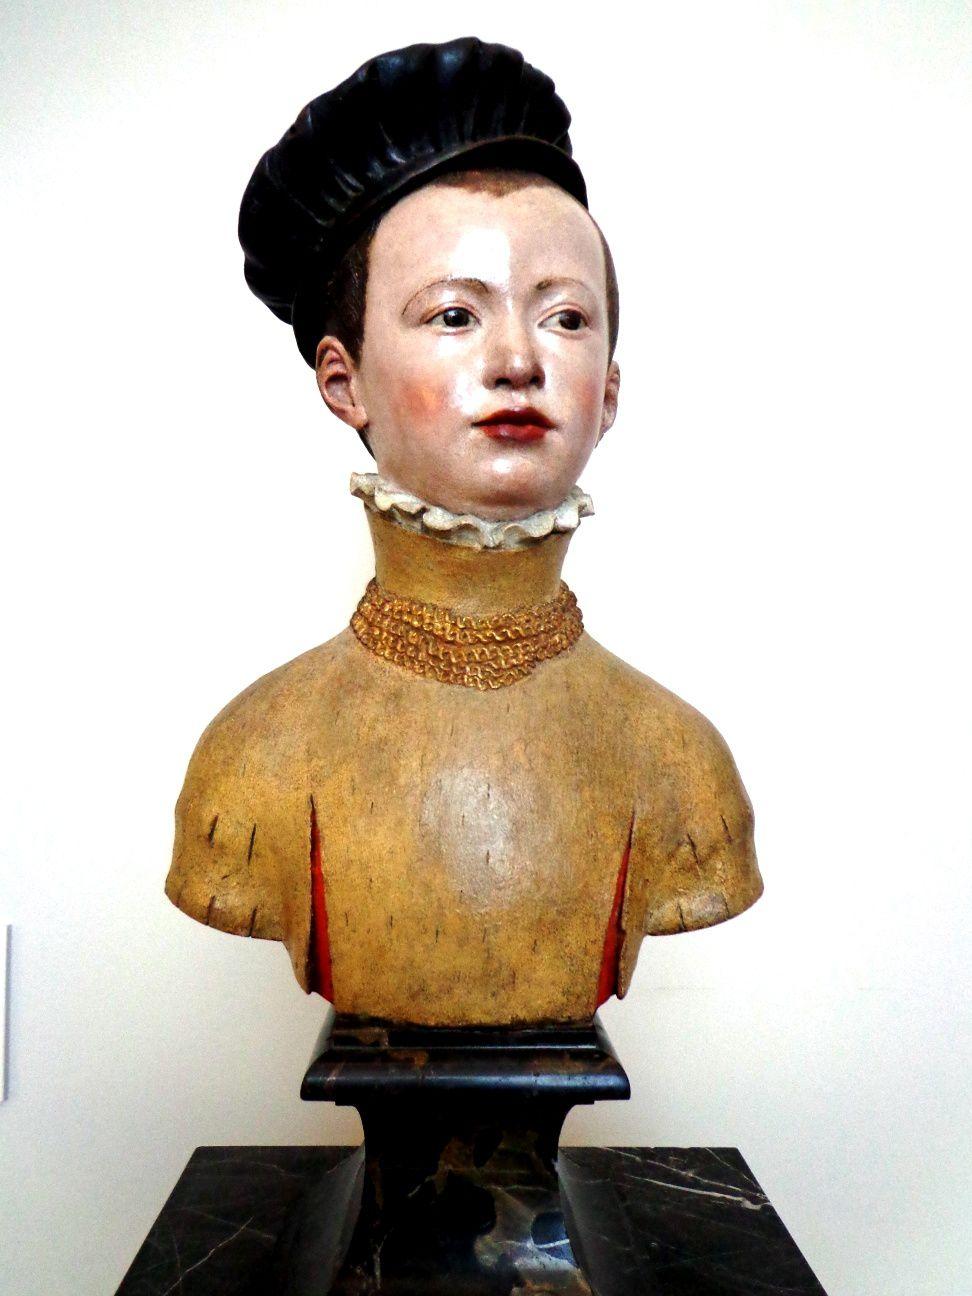 Buste d'un jeune prince - Germain Pilon, Paris, 1560